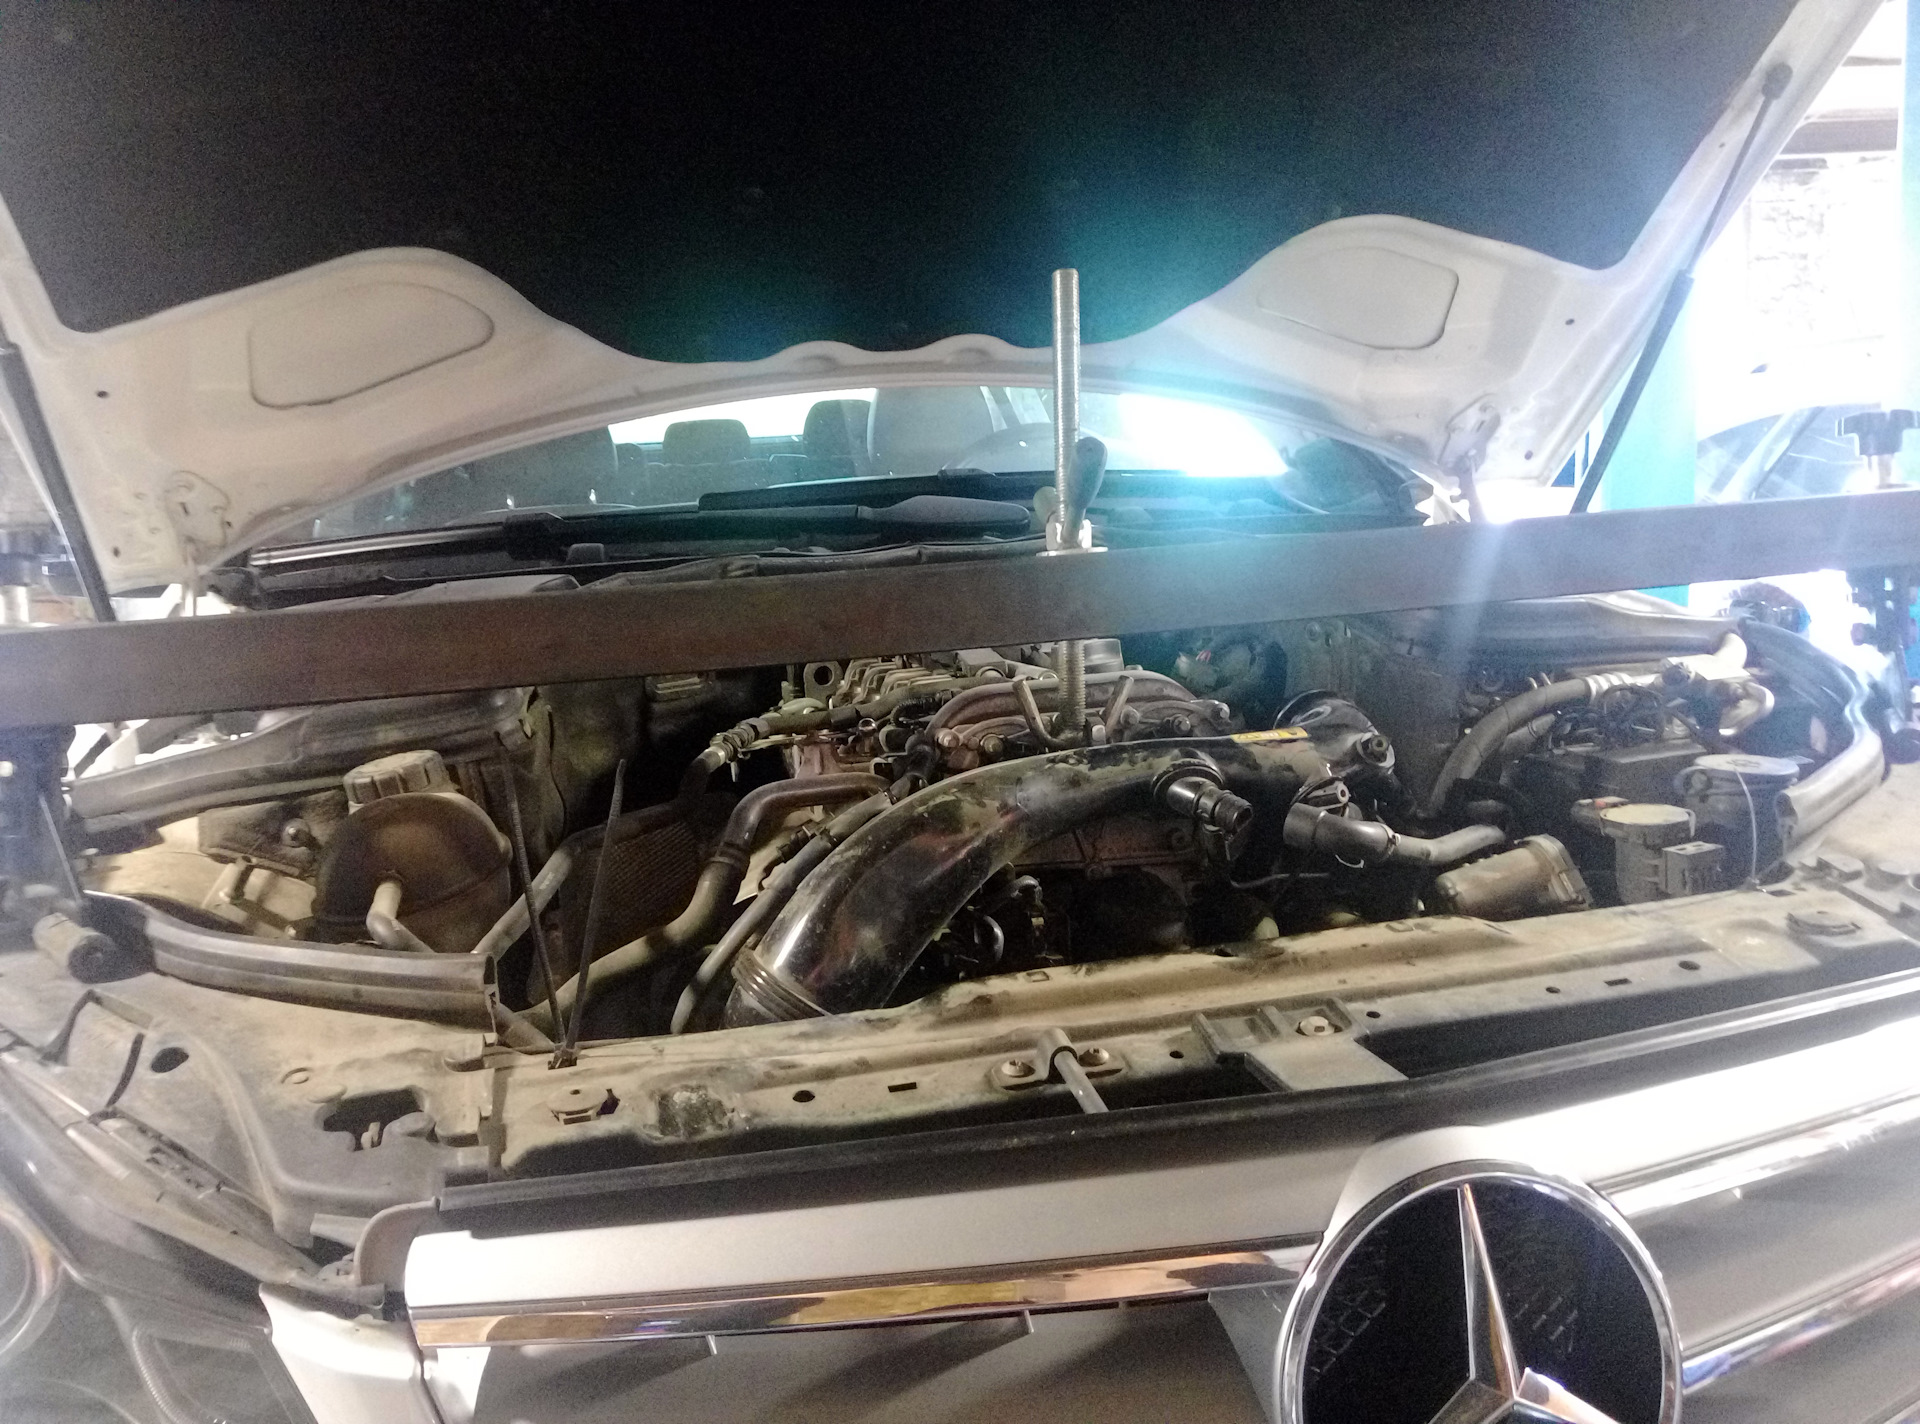 Поломка   P06DA00 — Mercedes-Benz C-class, 1 6 л , 2013 года на DRIVE2